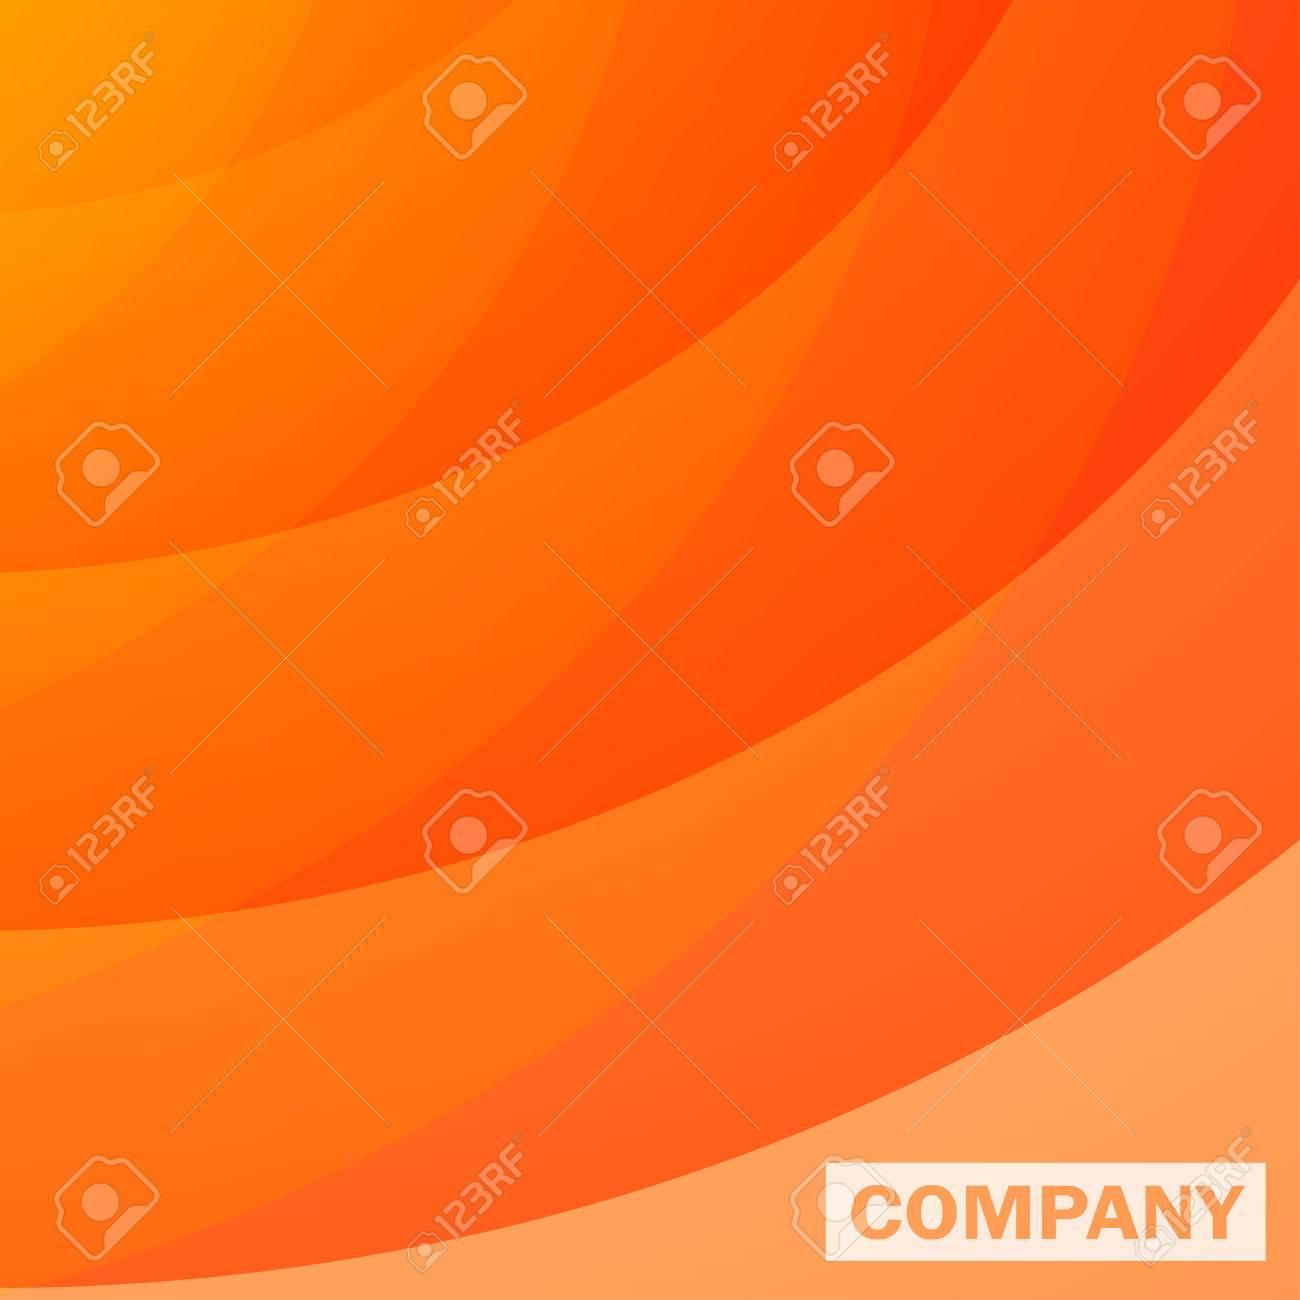 Design Background EPS10 Vector - 51785663